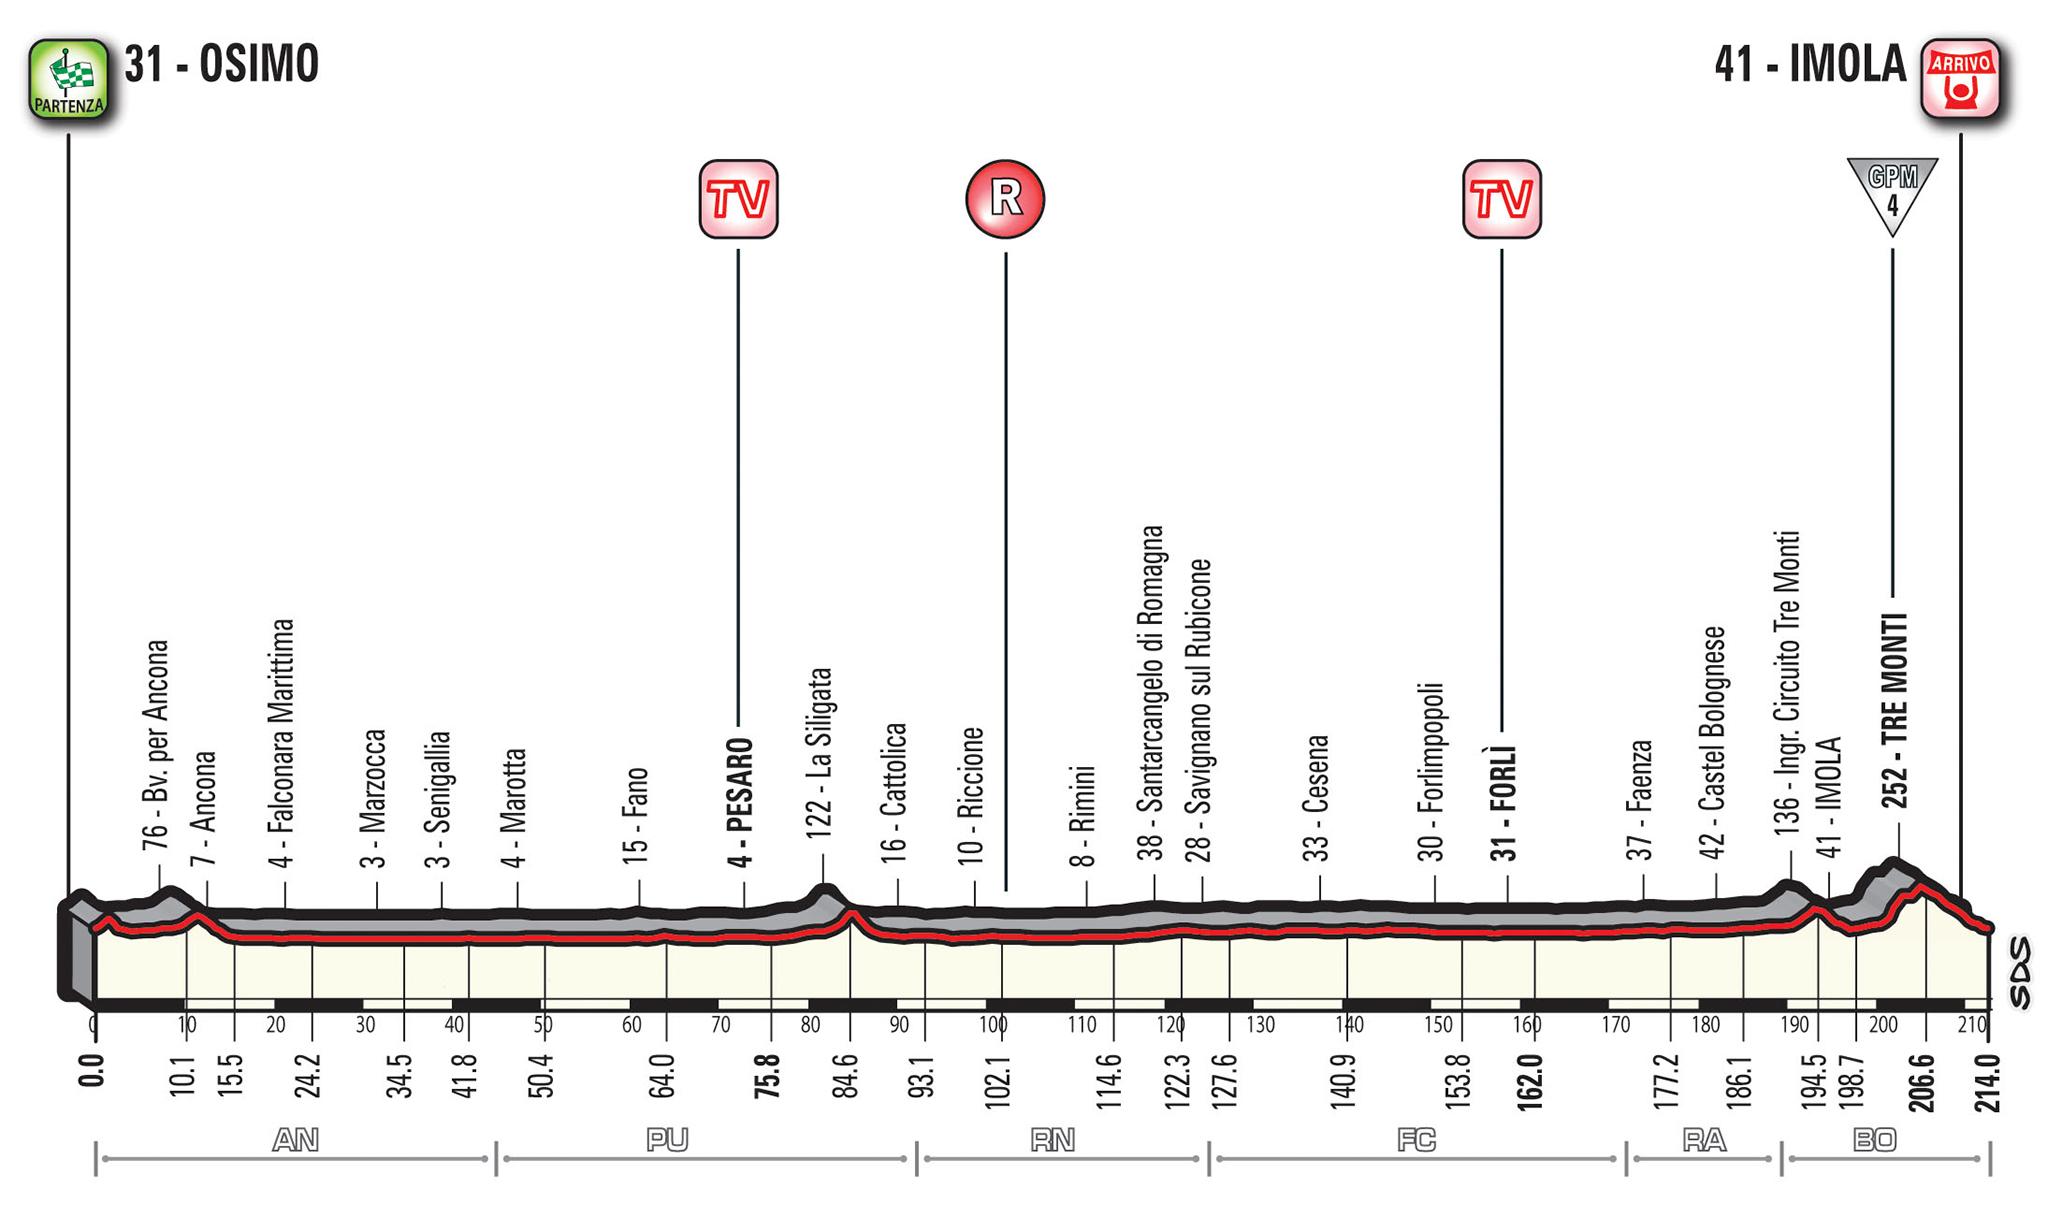 Giro 2018 tappa 12 altimetria